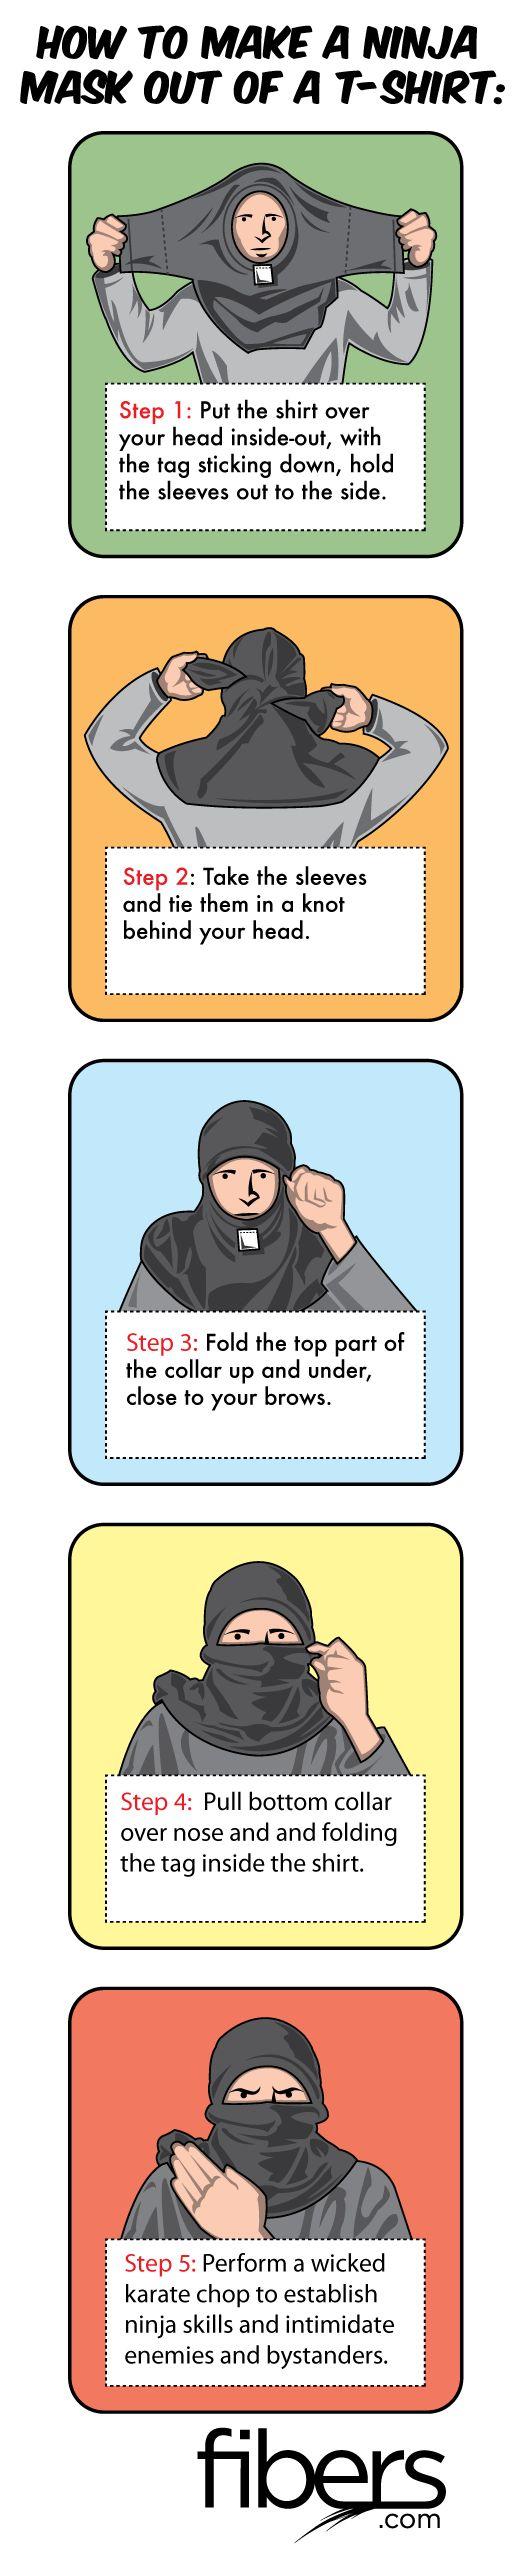 Make a Ninja Mask from T-Shirt